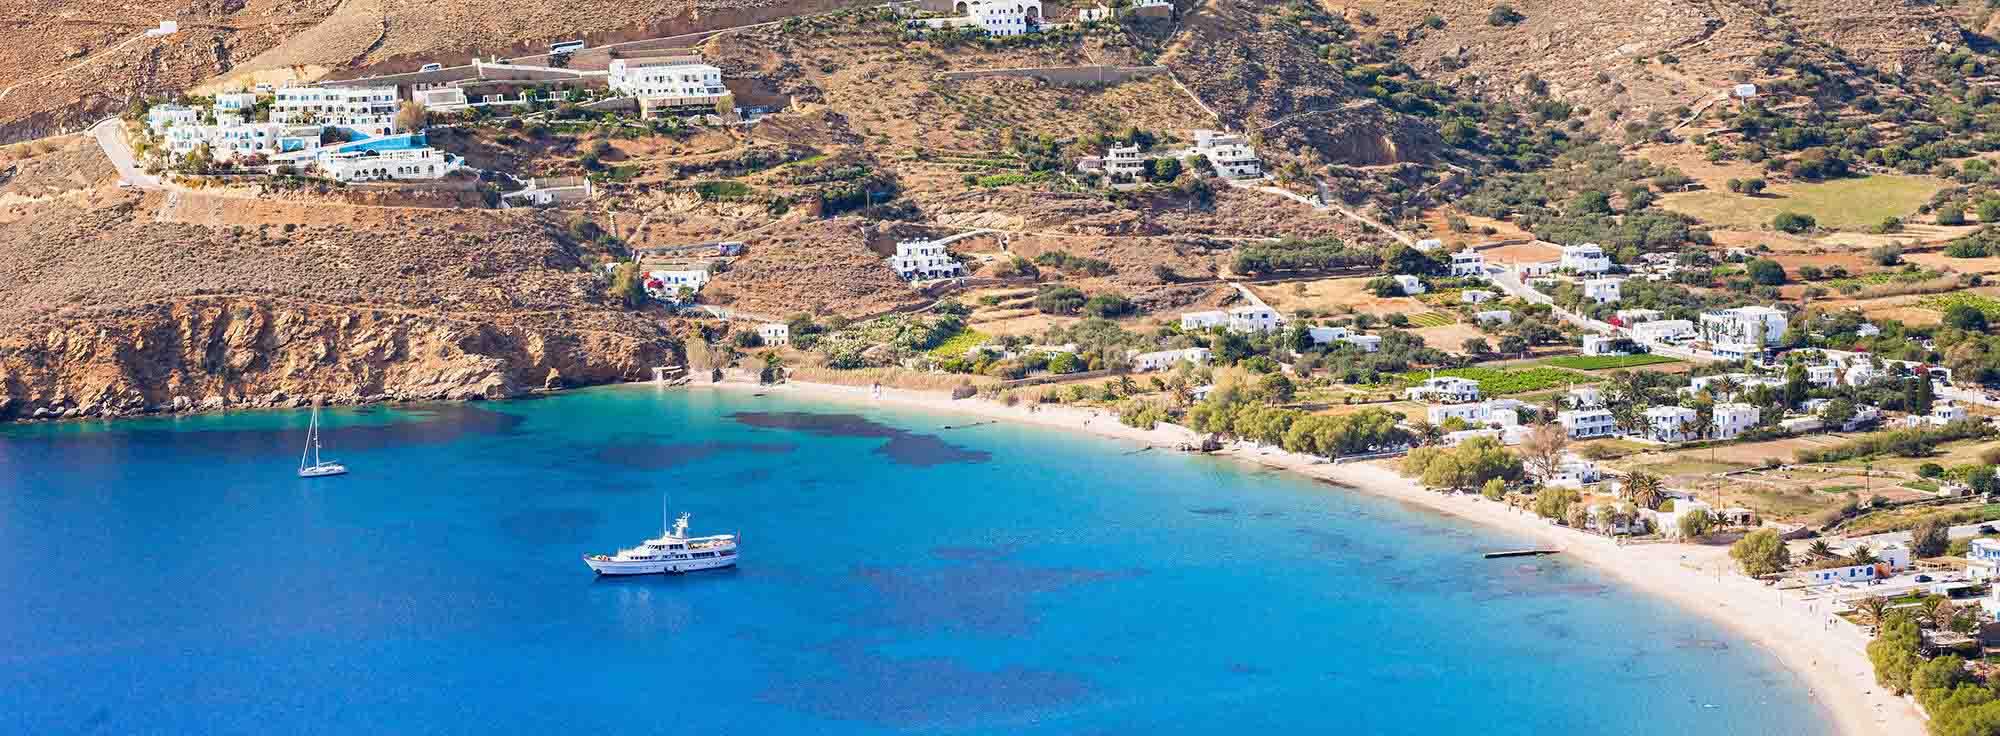 Greece - Amorgos 7 (main)